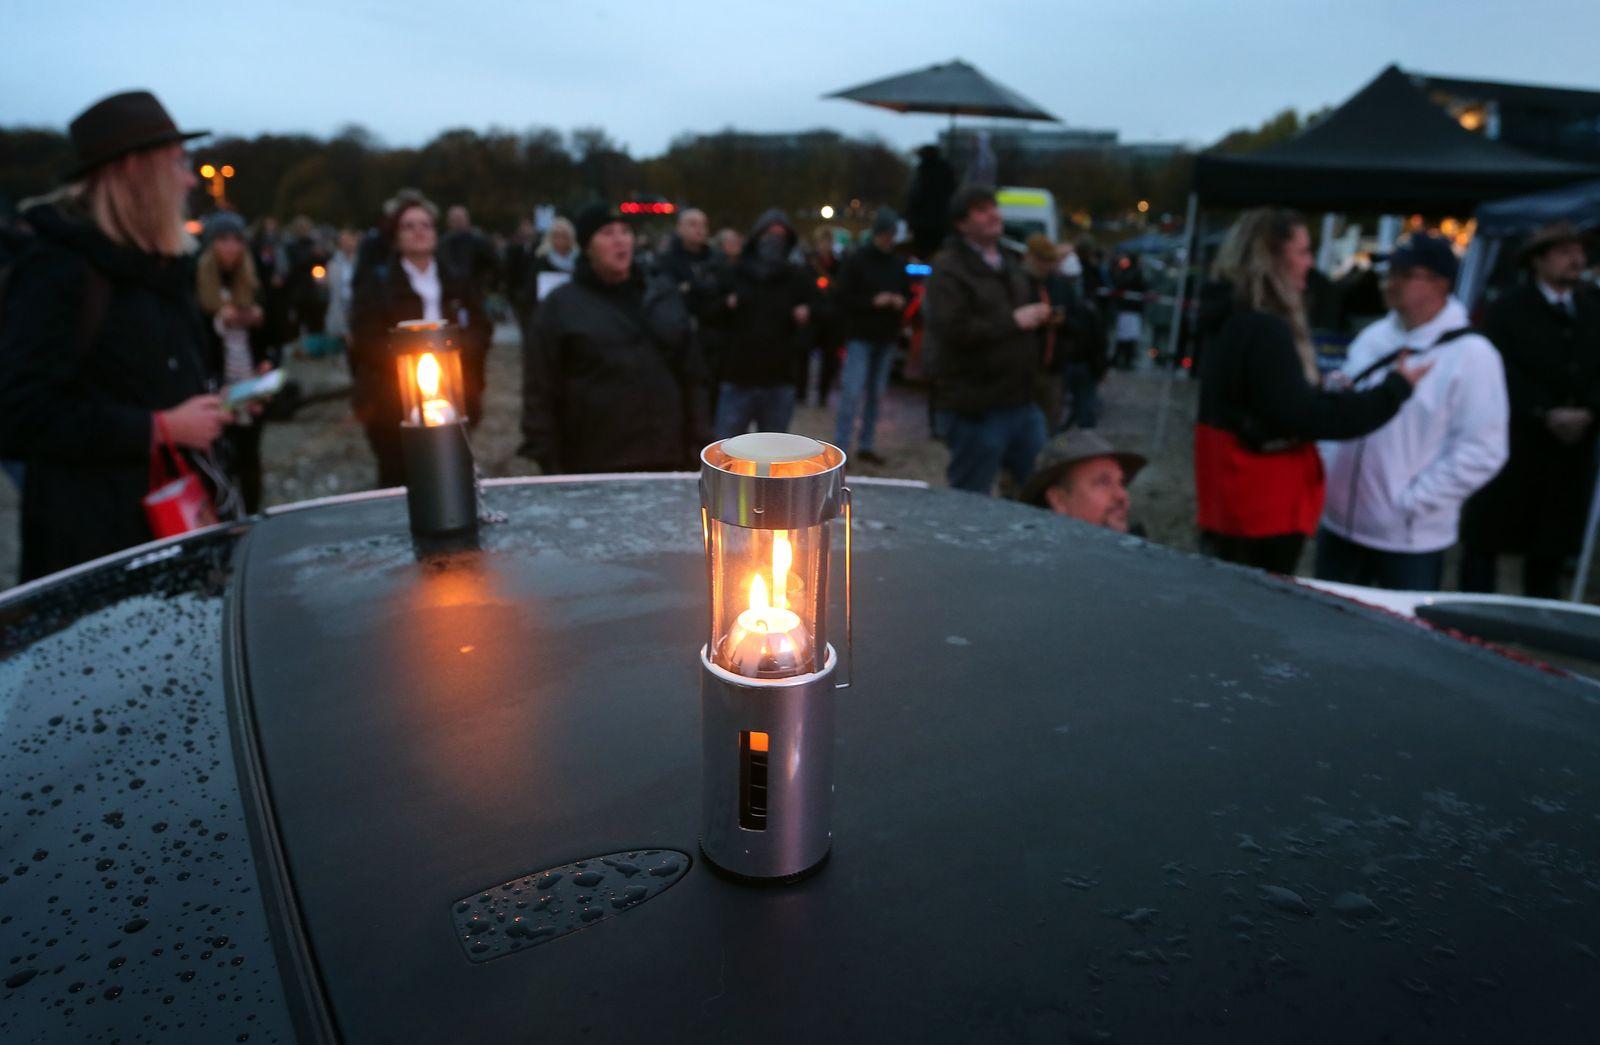 Coronavirus - München - Protest gegen Maßnahmen